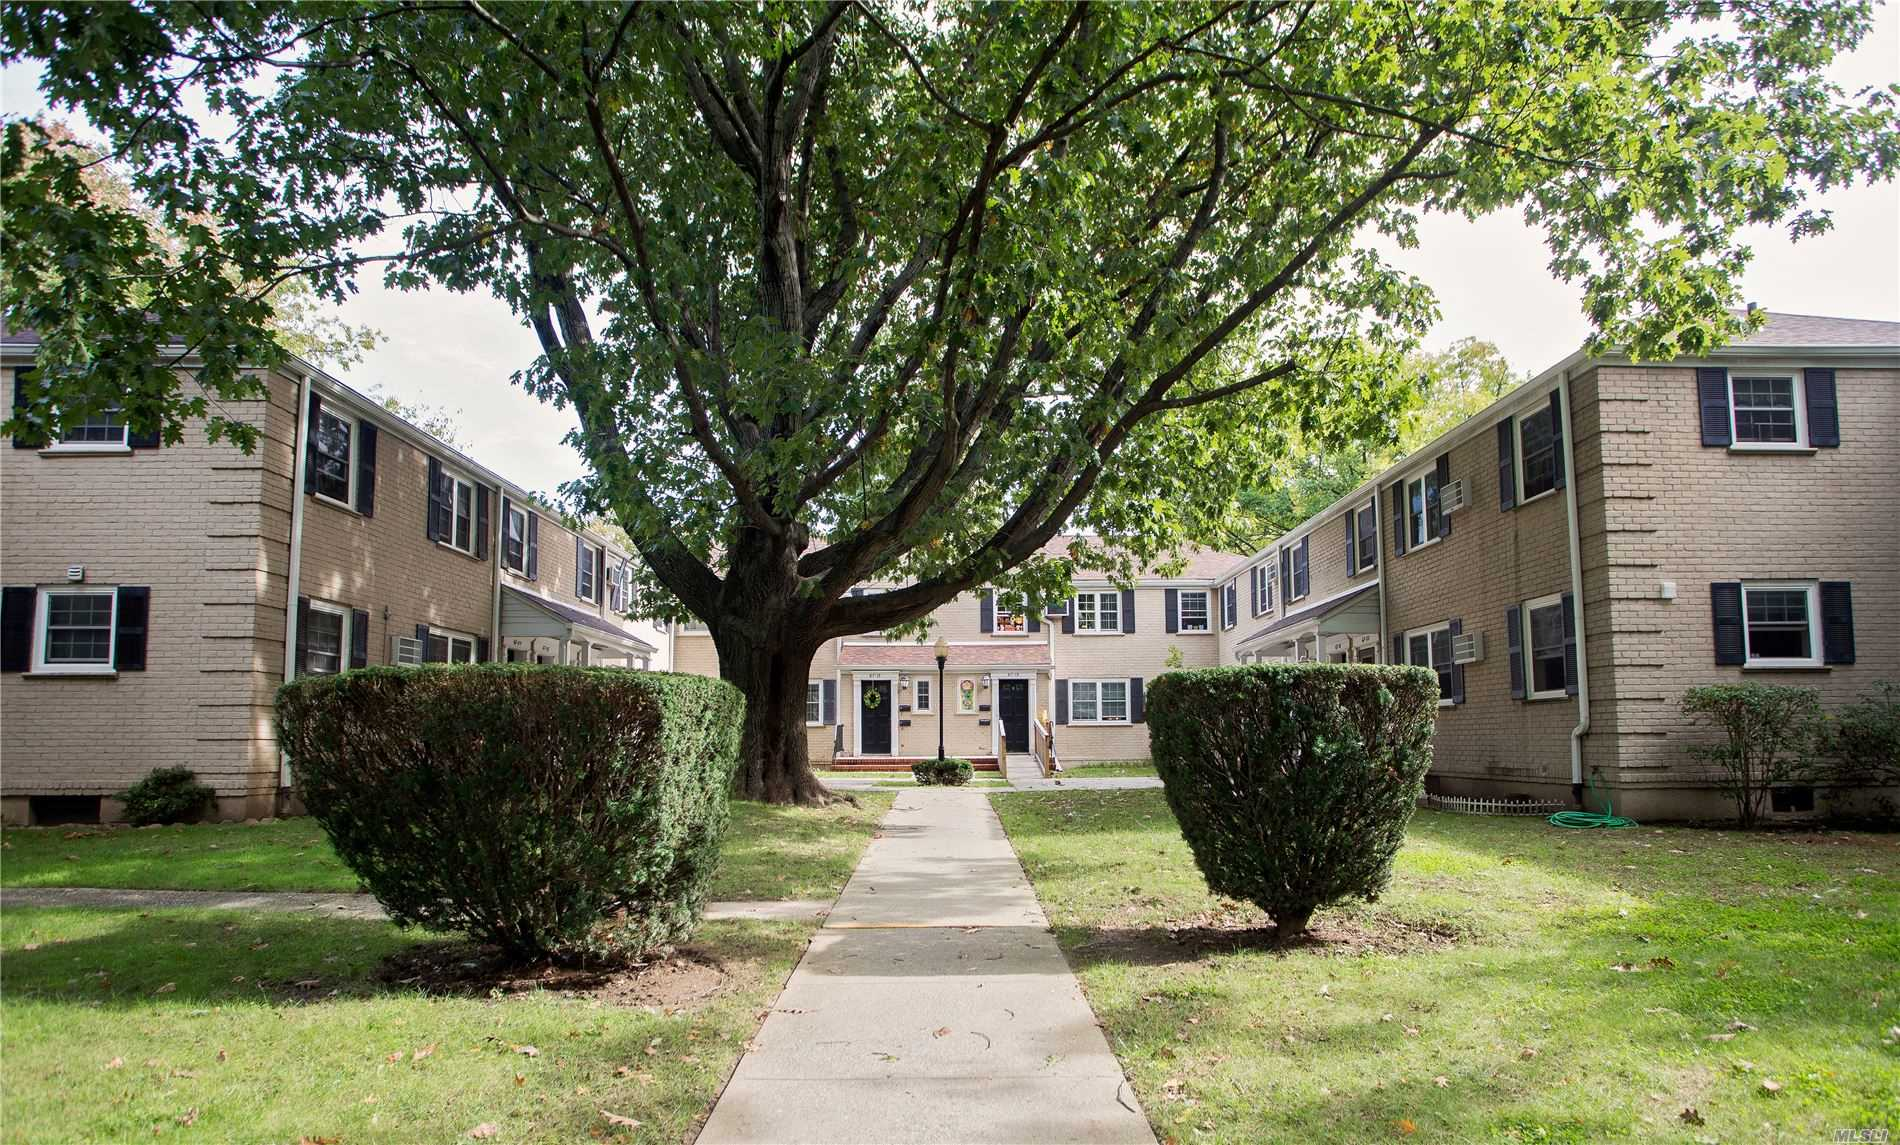 67-23 Springfield Blvd, A - Oakland Gardens, New York